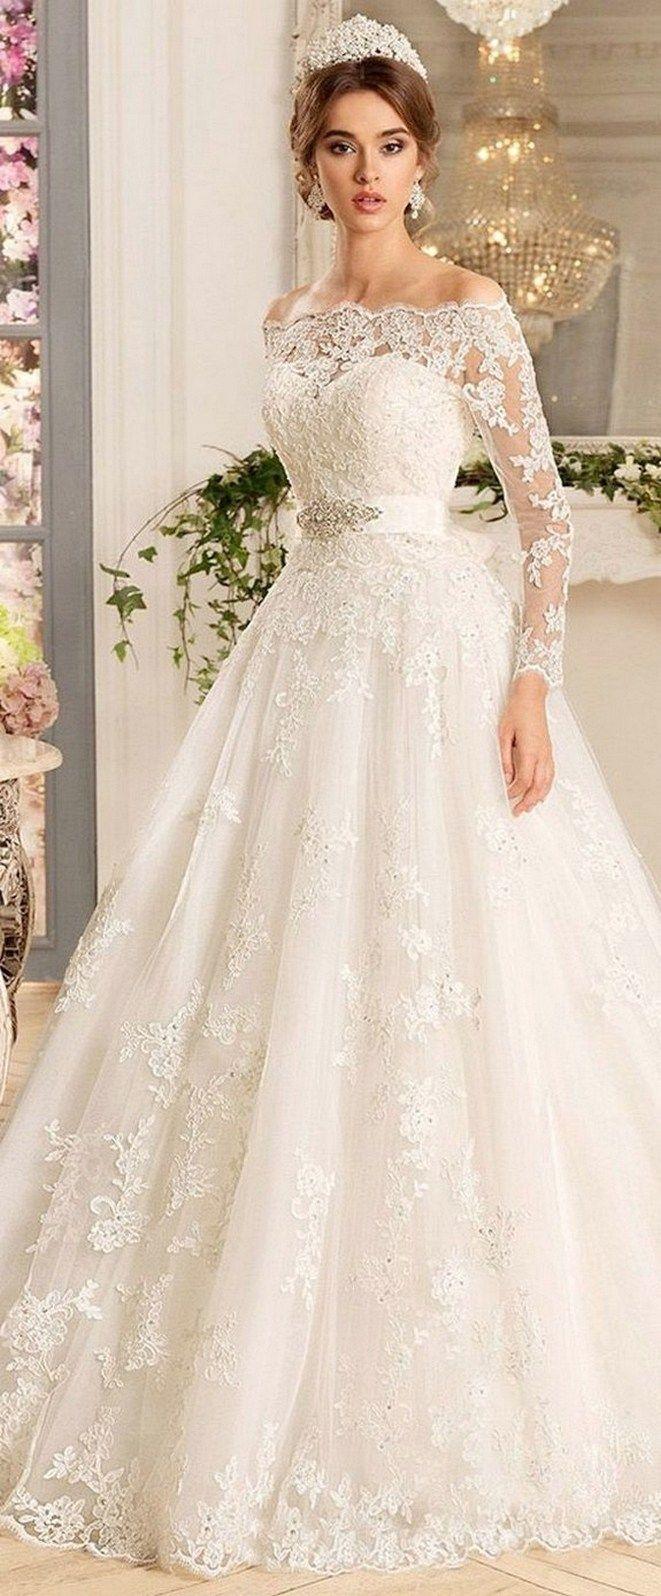 70 Romantic Valentine S Day Wedding Dress Ideas Bridal Dresses Wedding Dresses Dream Wedding Dresses